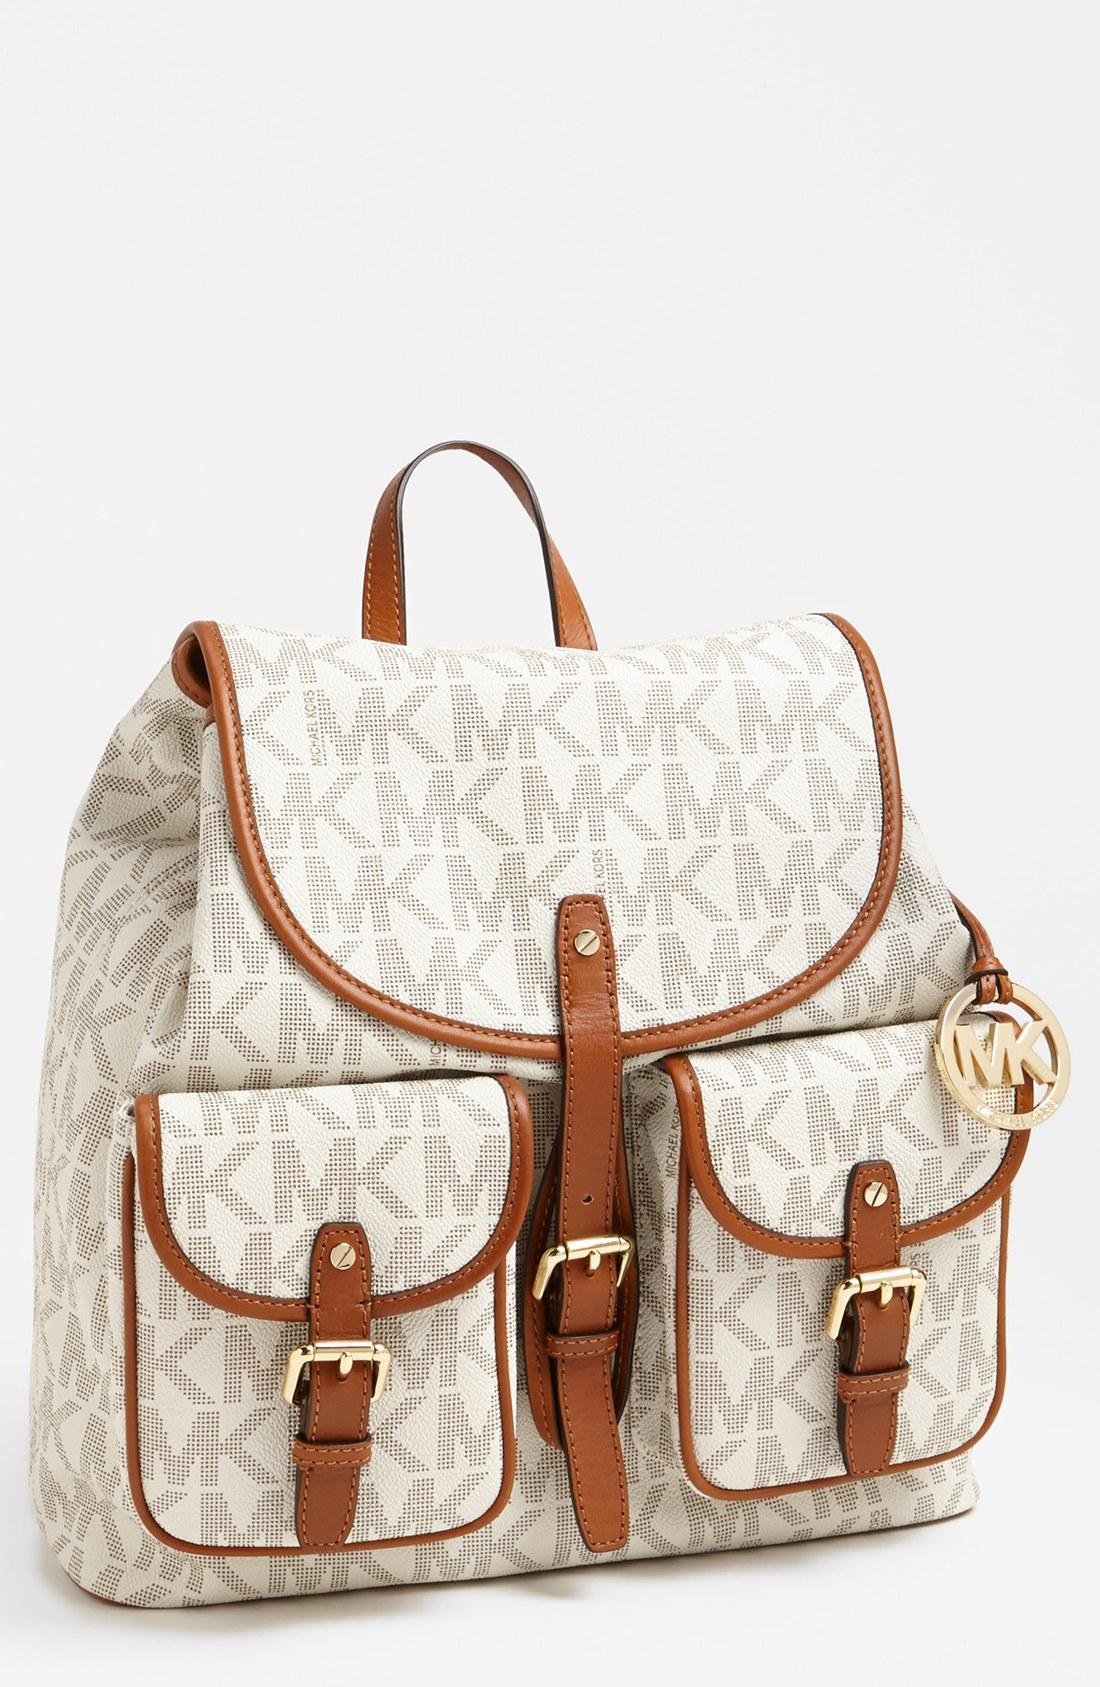 michael michael kors jet set backpack in white vanilla lyst. Black Bedroom Furniture Sets. Home Design Ideas